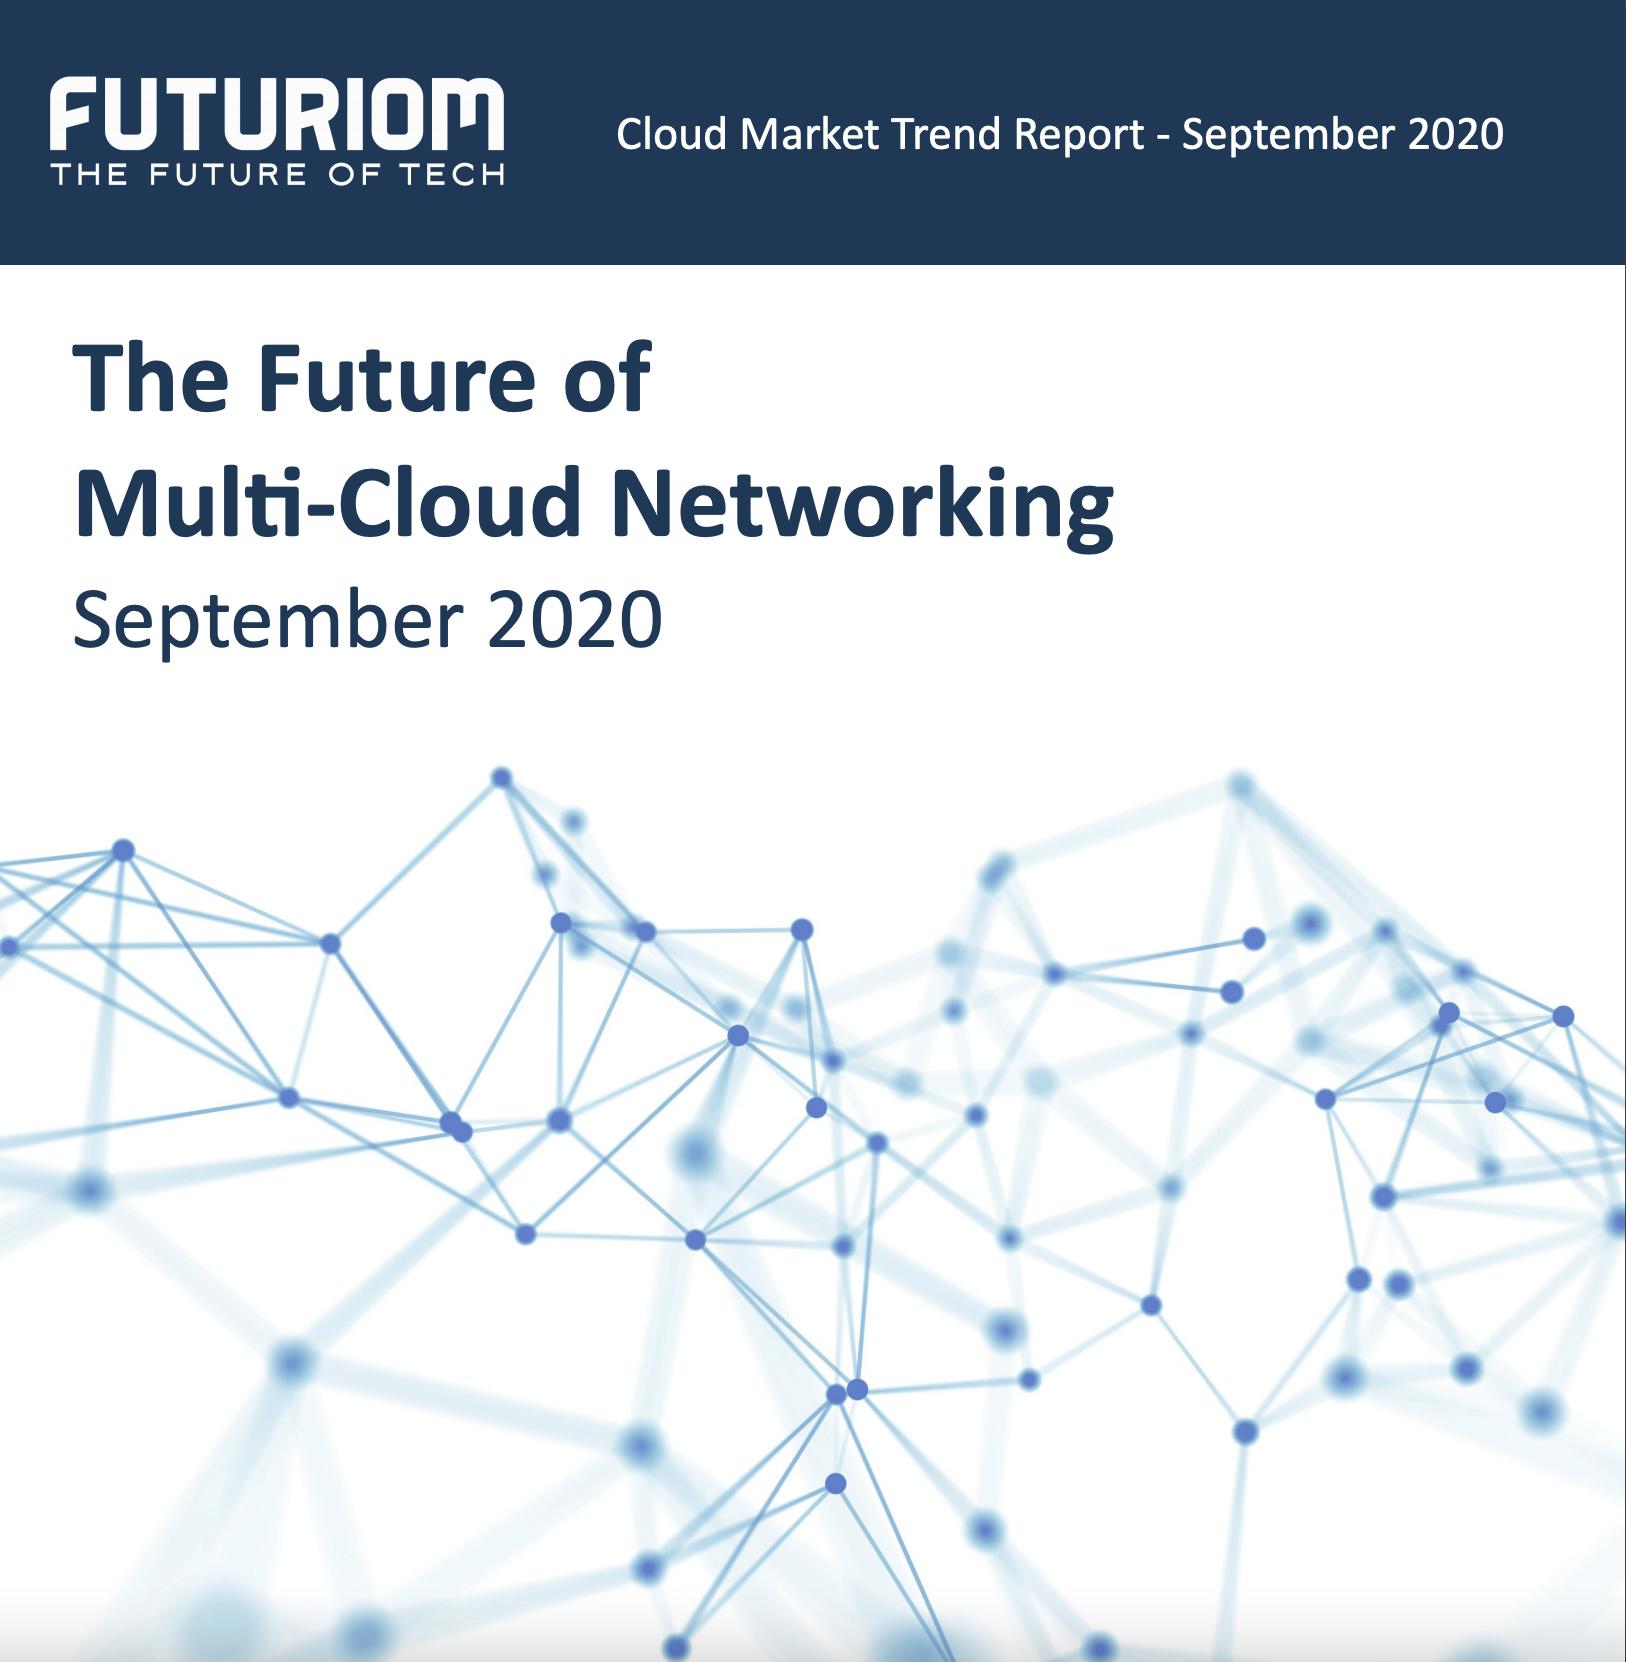 Futuriom - The Future of Multi-Cloud Networking